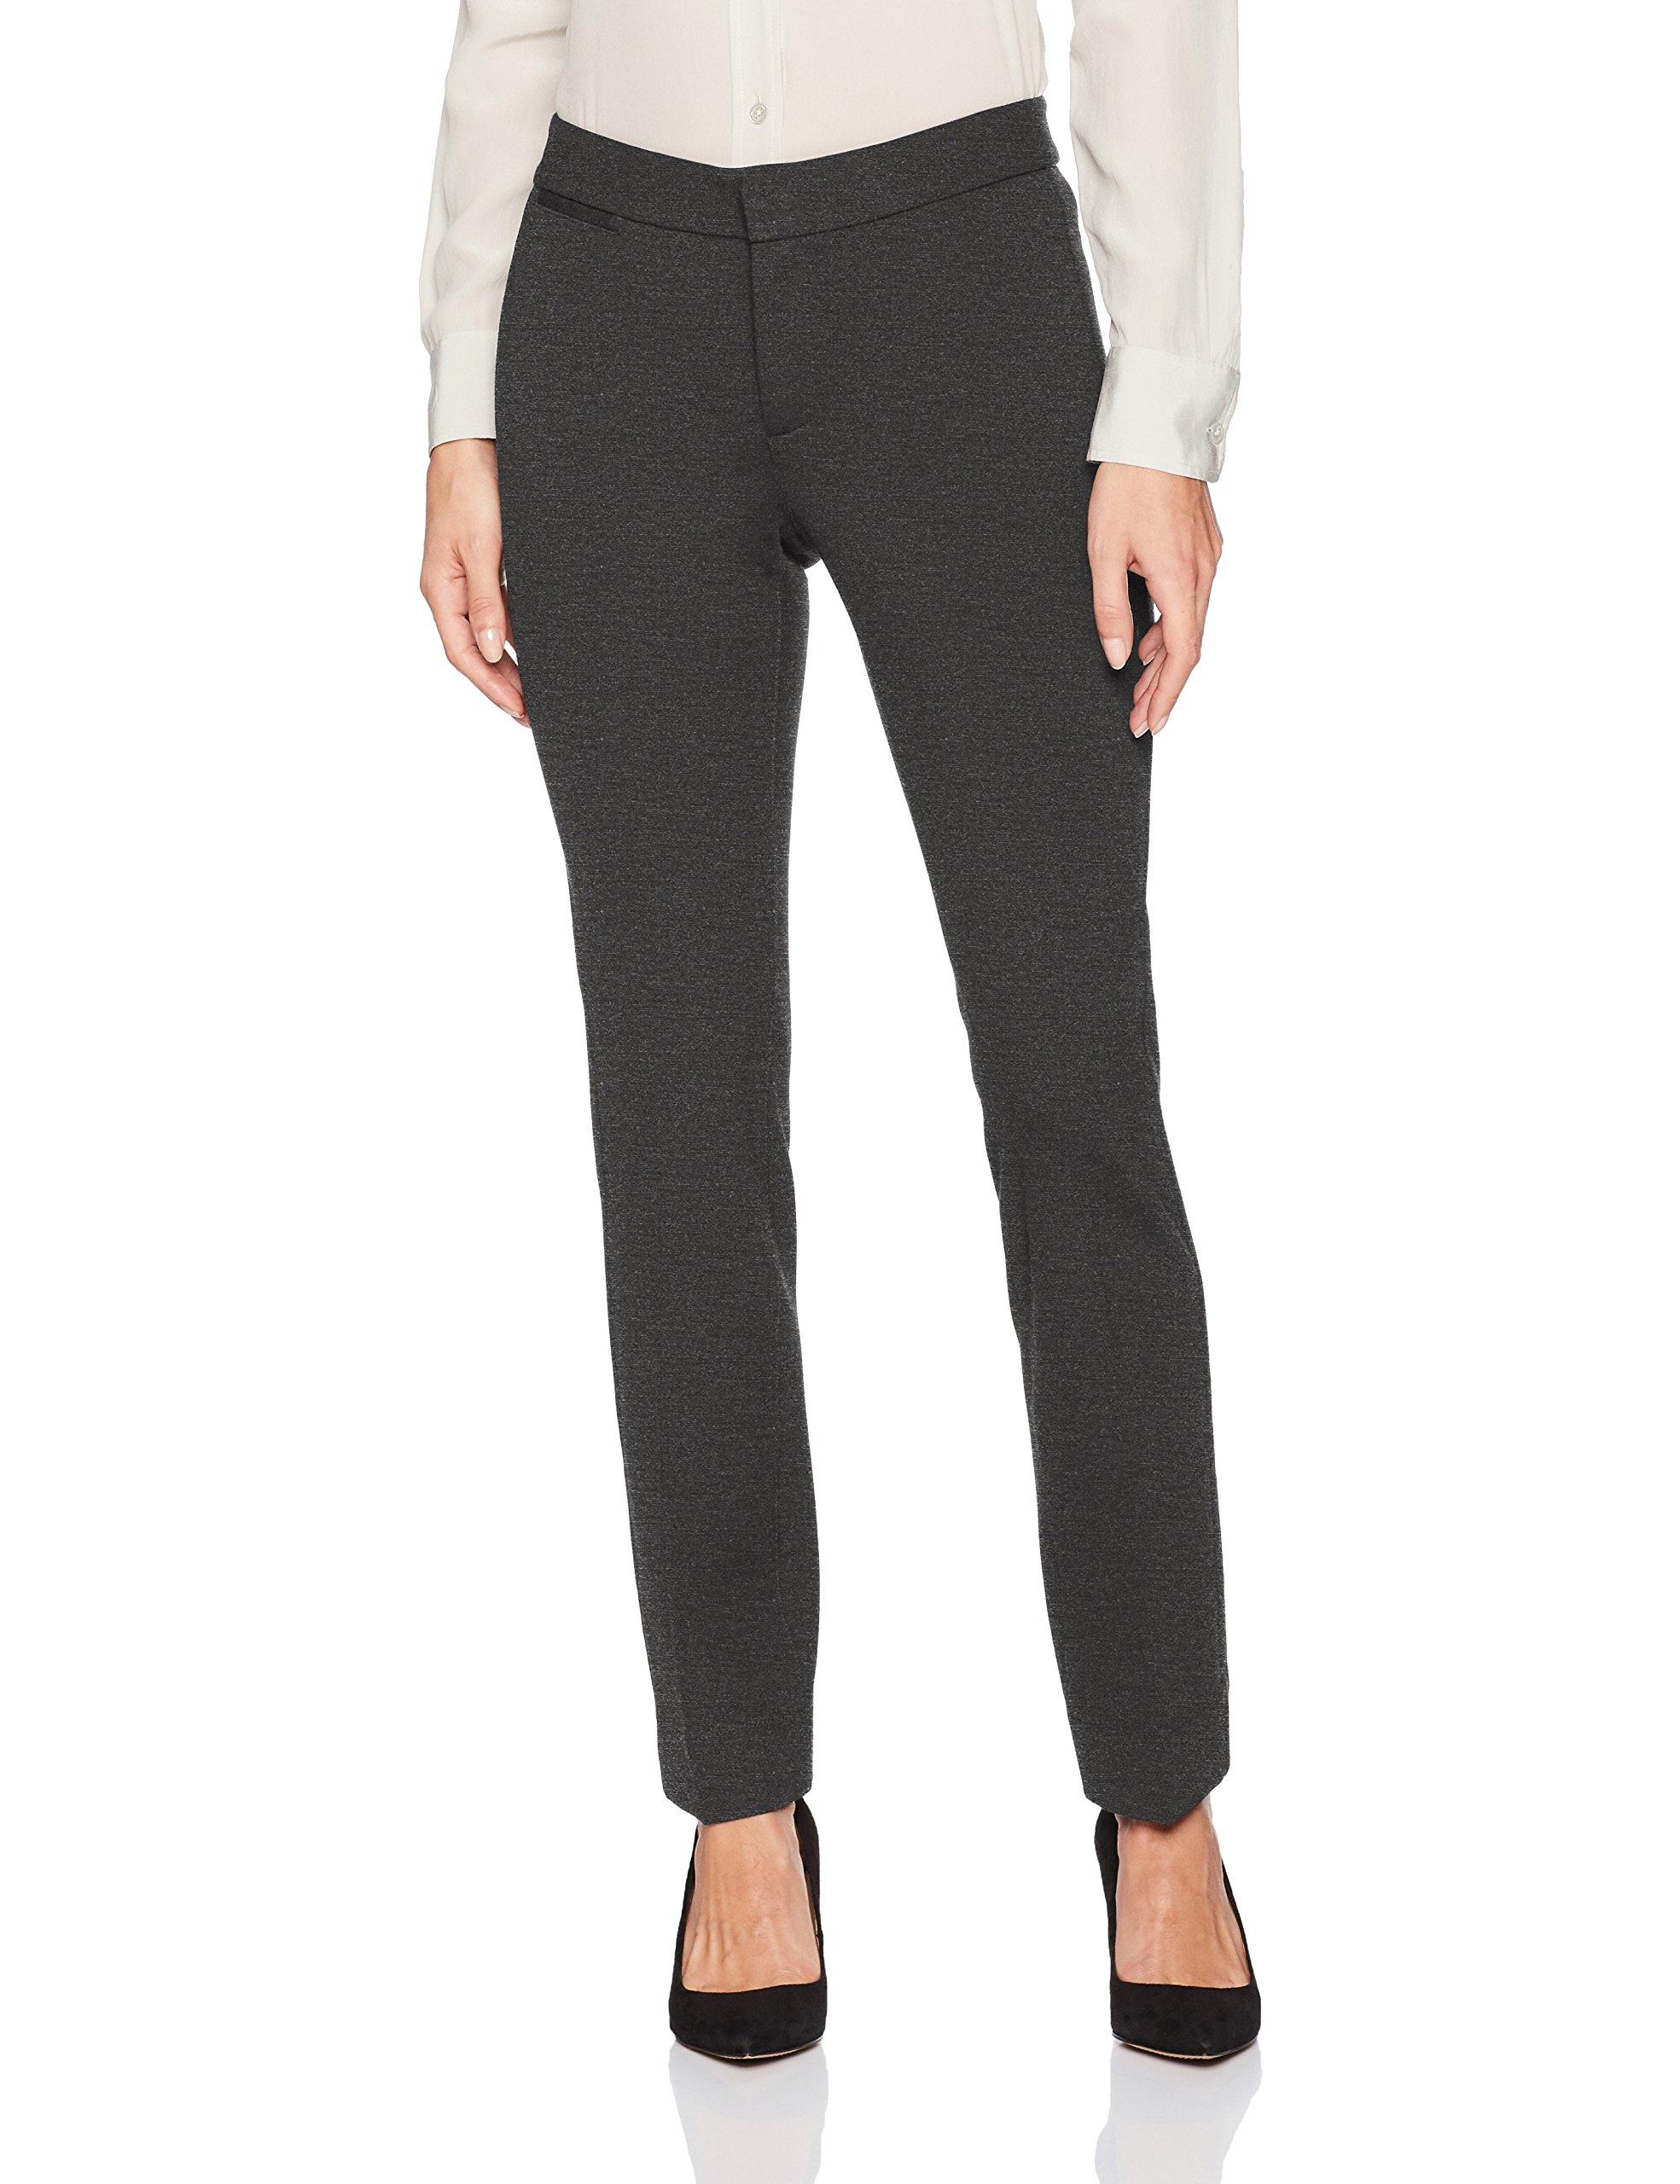 NYDJ Women's Petite Size Ponte Knit Trouser Pants, Charcoal Heather, 4P